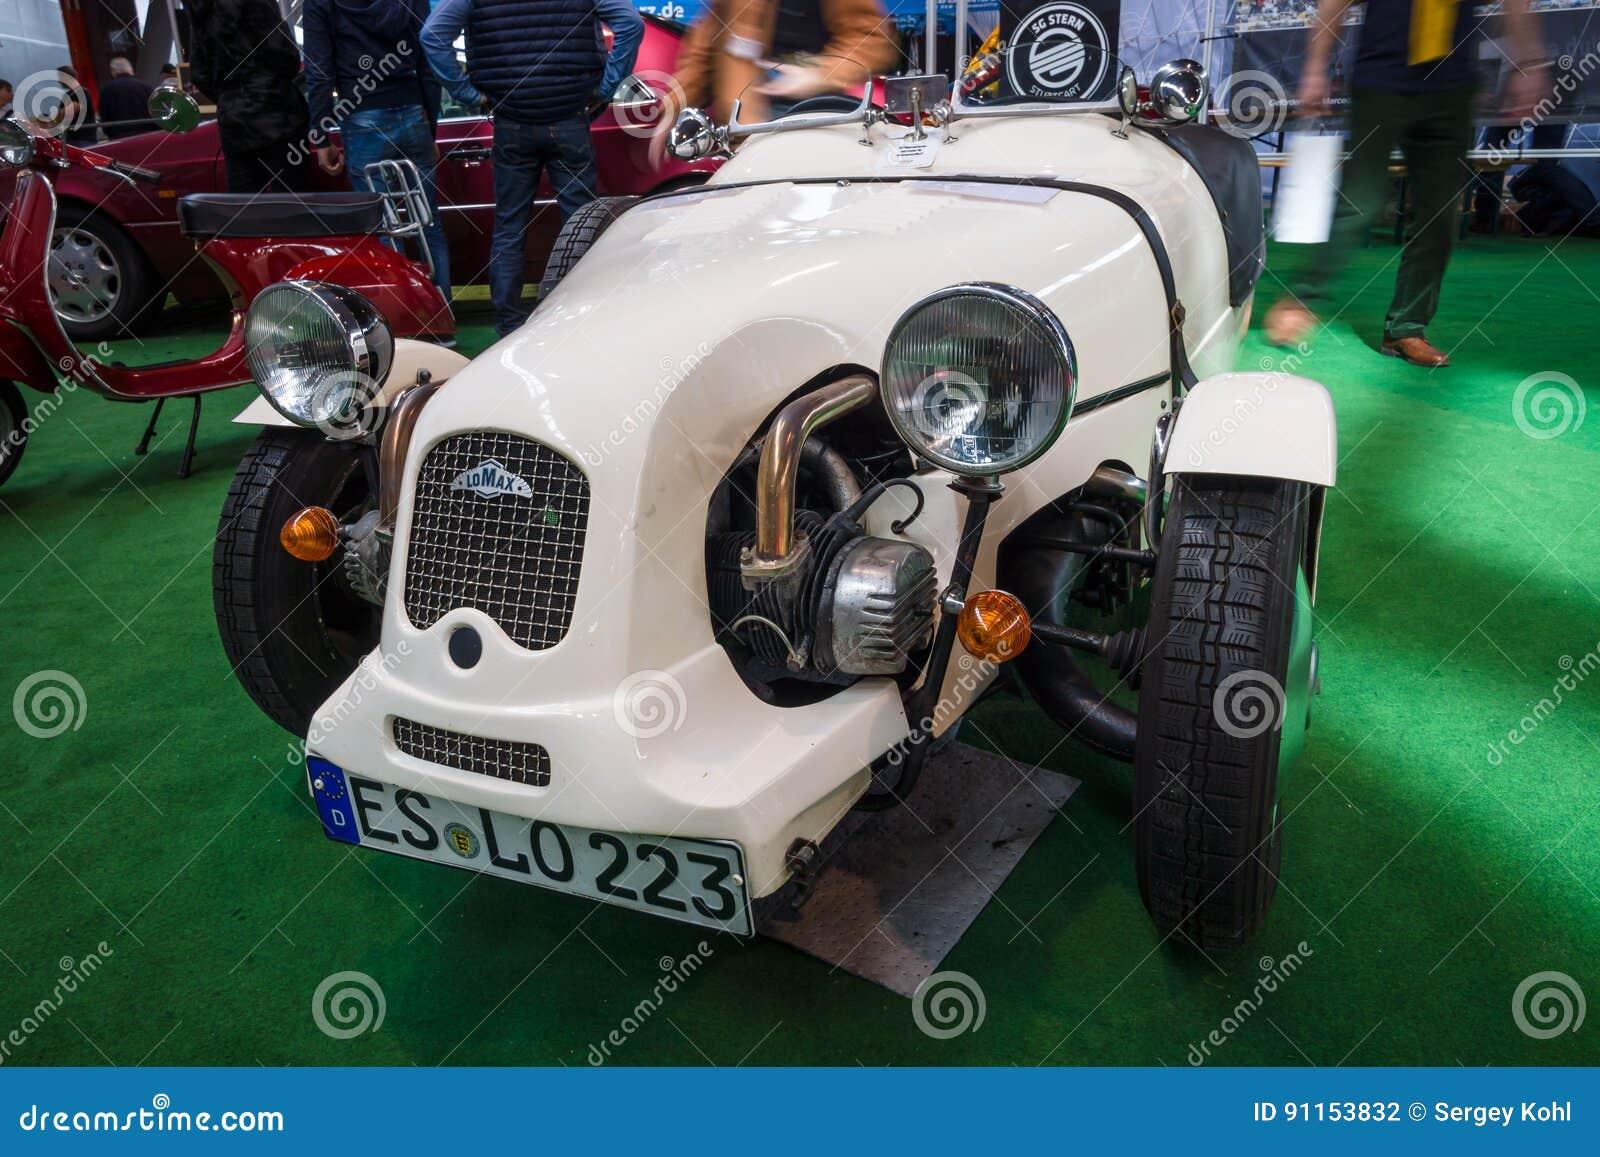 a british kit car lomax 223 based on the mechanical. Black Bedroom Furniture Sets. Home Design Ideas